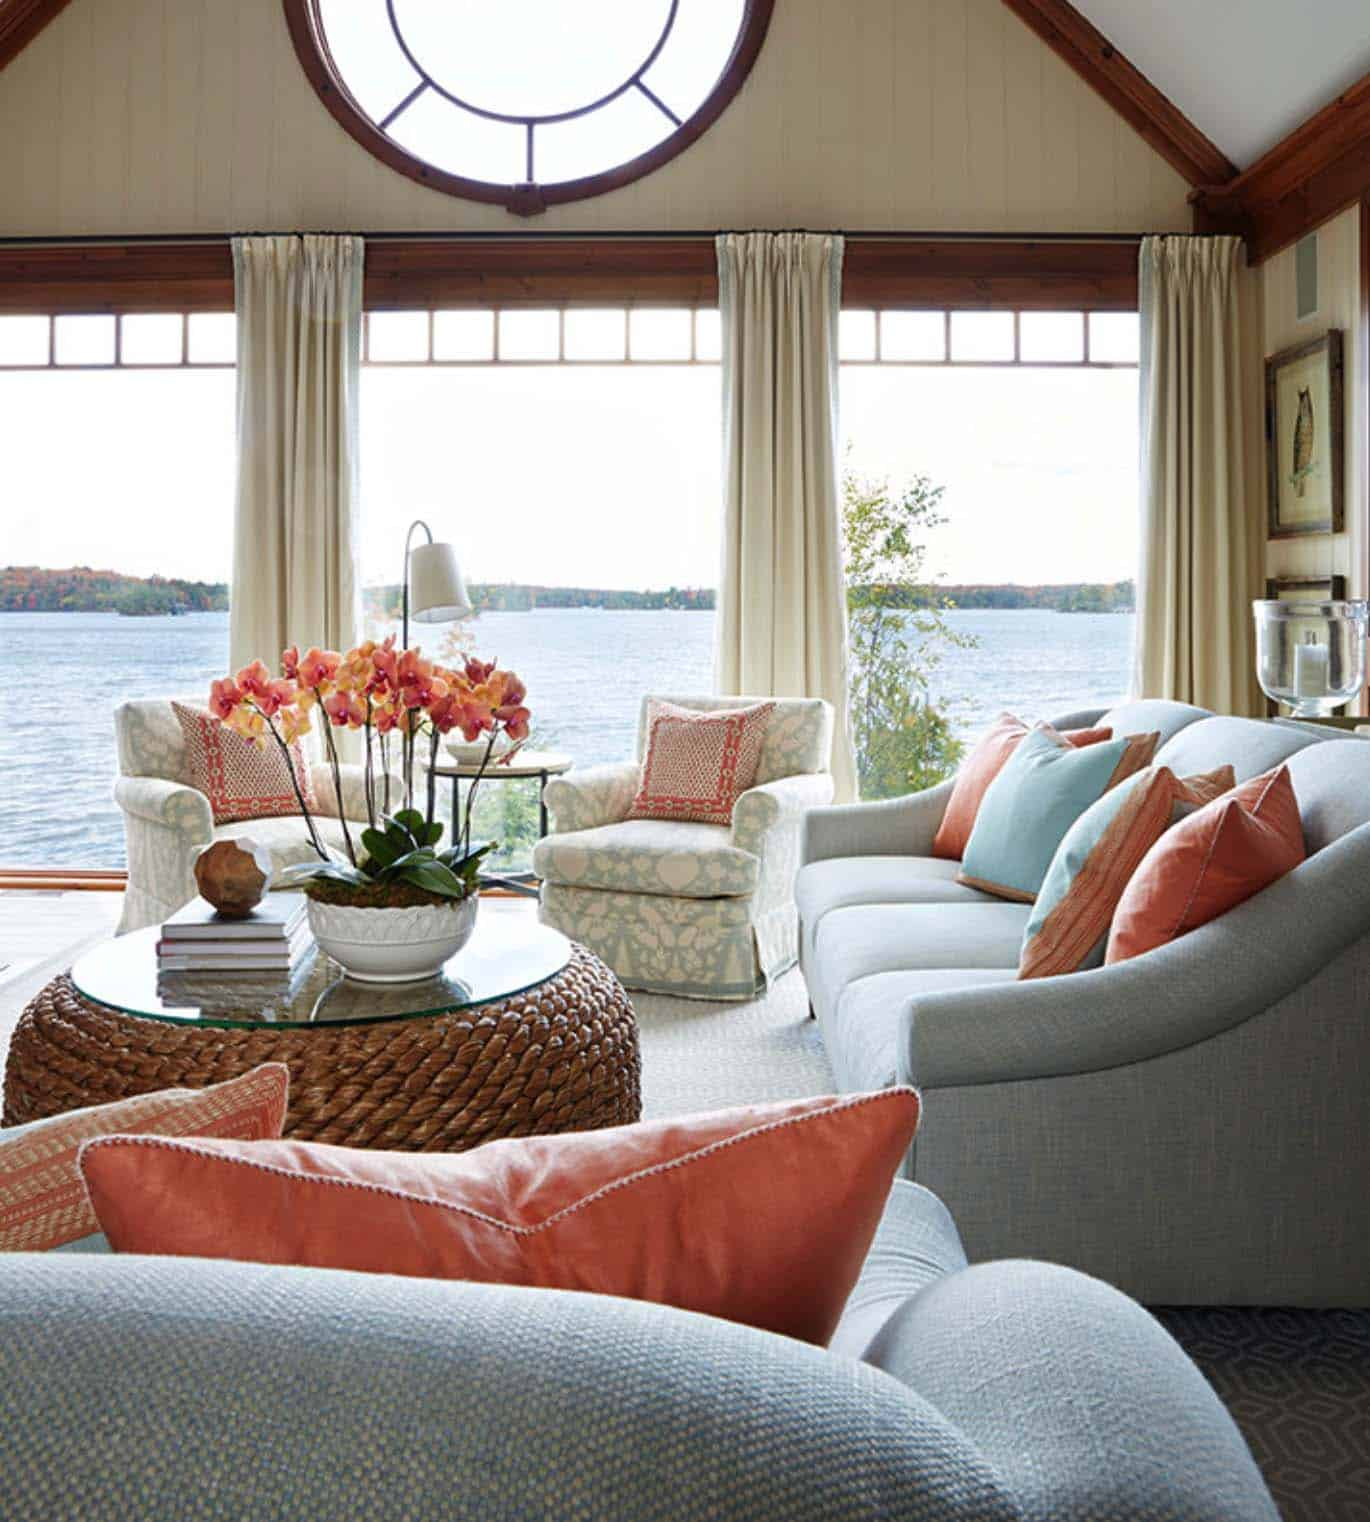 Muskoka Lake House-Anne Hepfer Designs-02-1 Kindesign